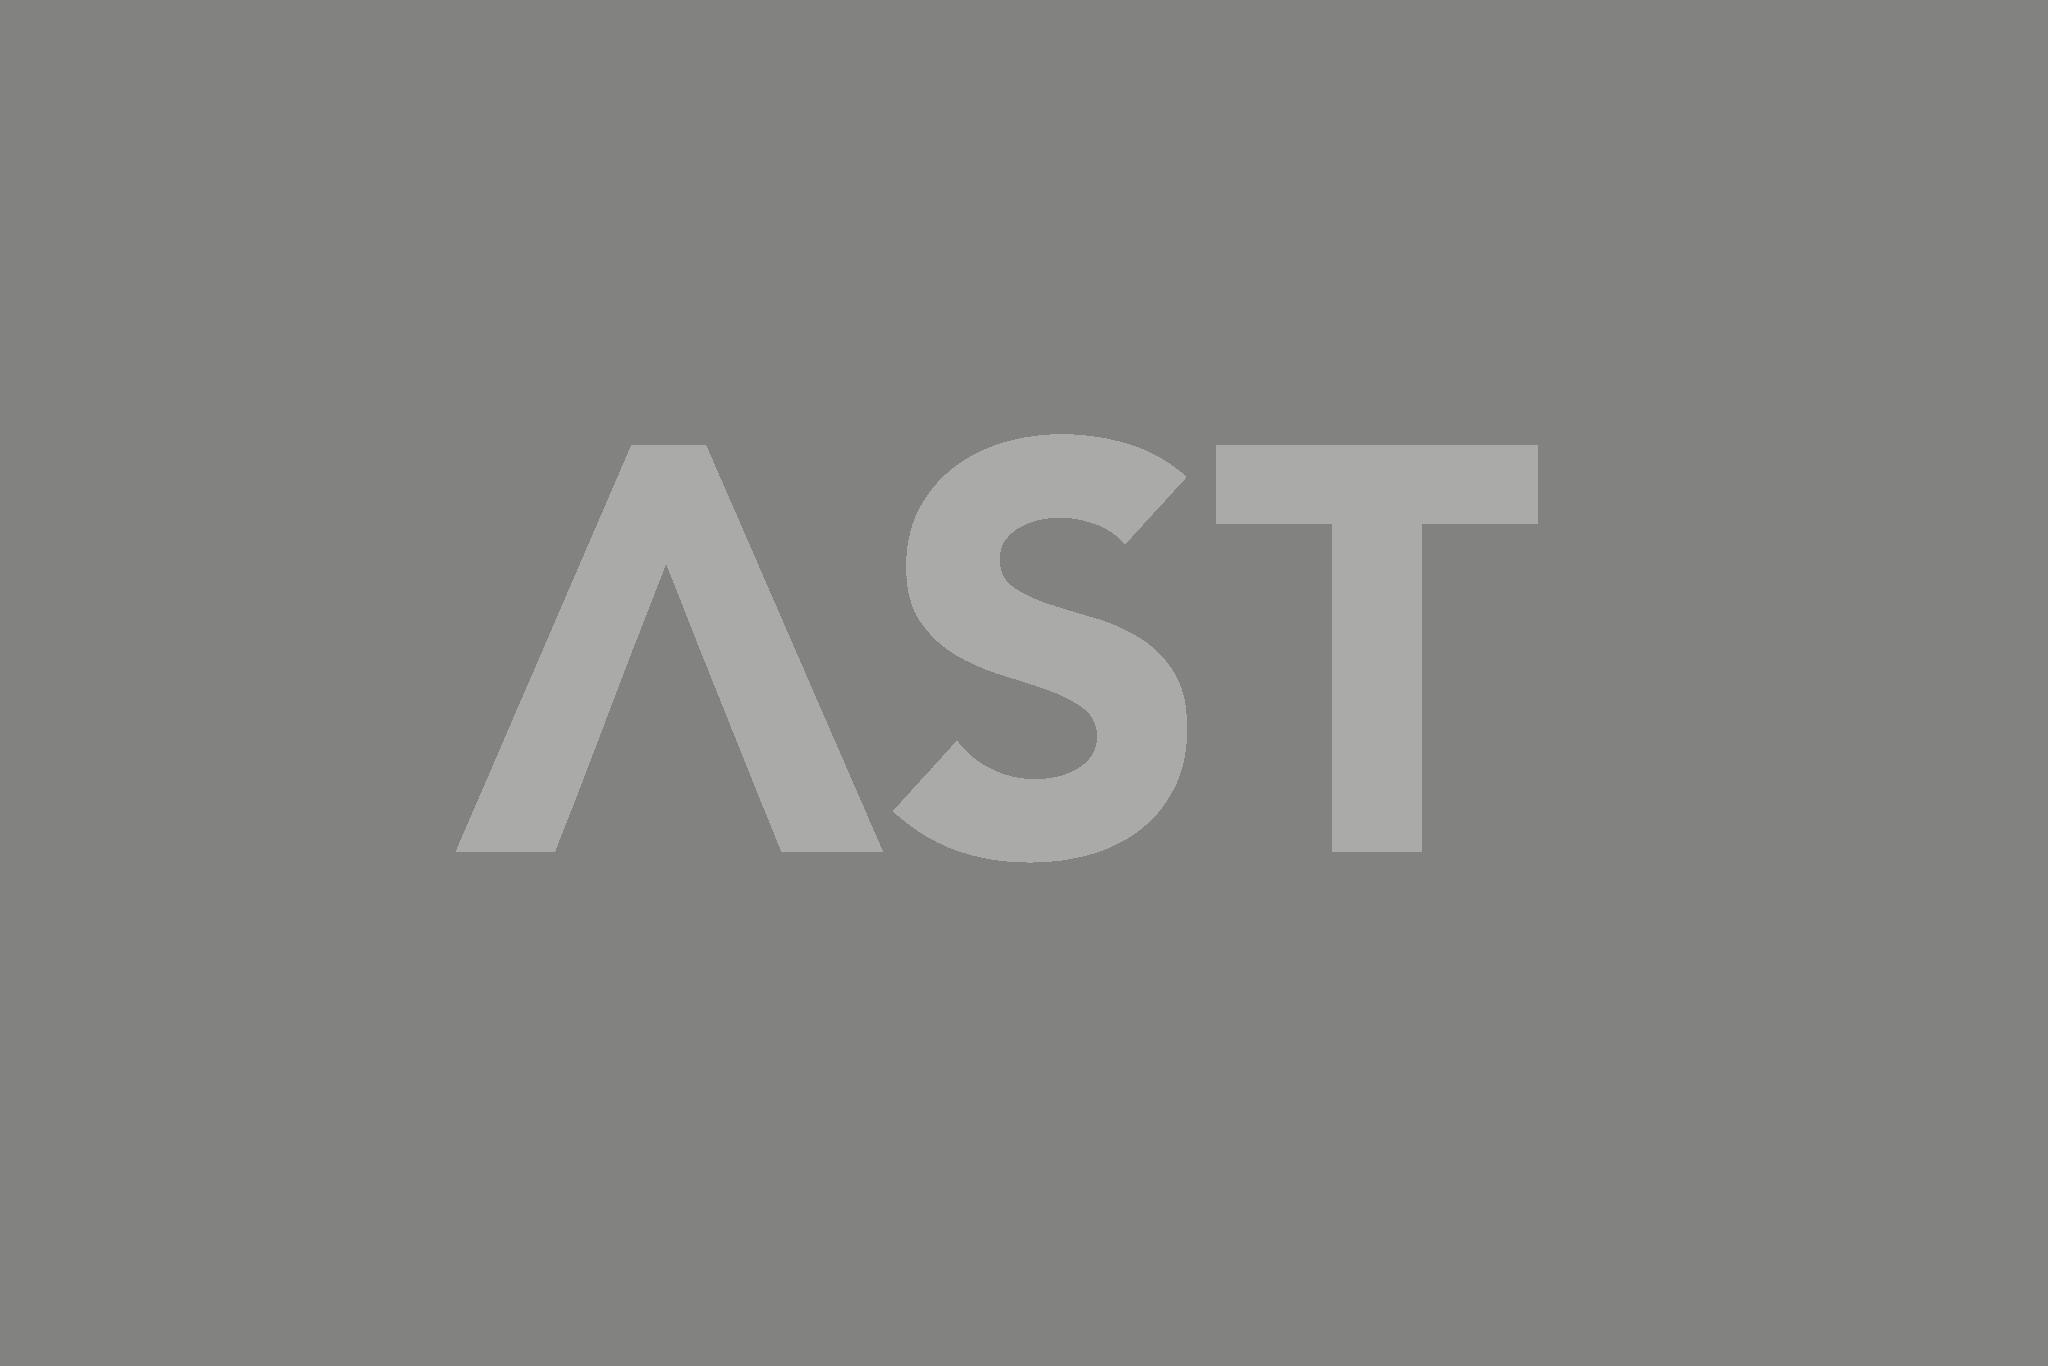 ast-logo-transparent